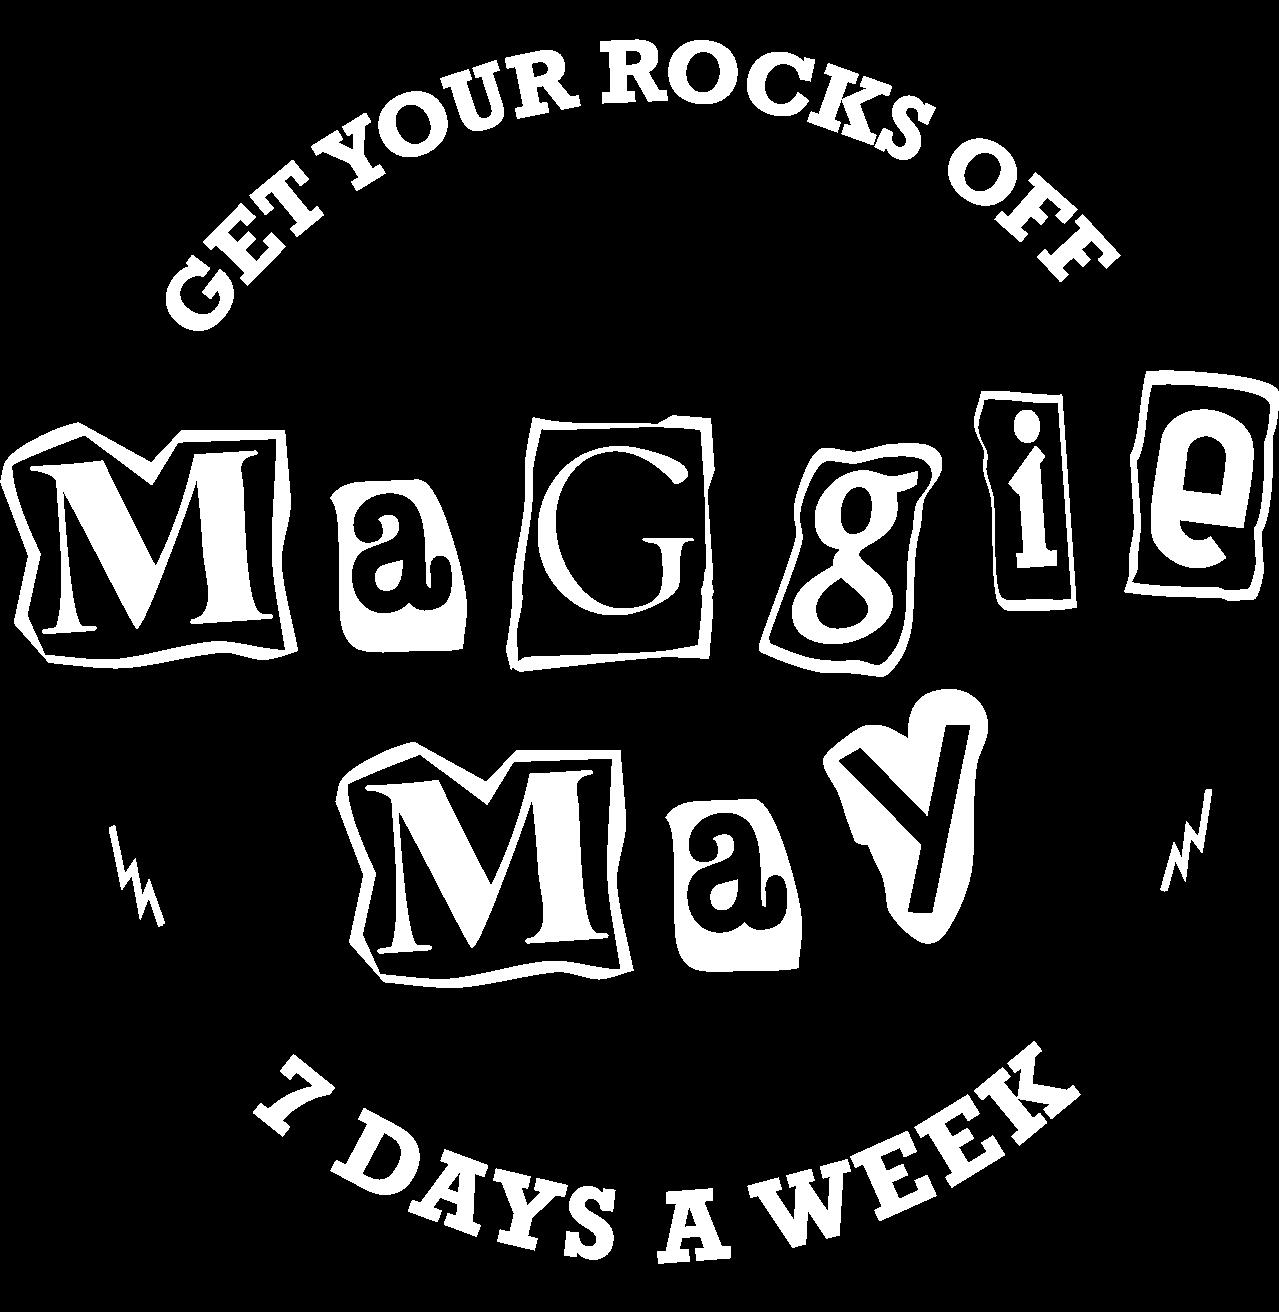 Maggies - Circular with Captioon - Logo.png